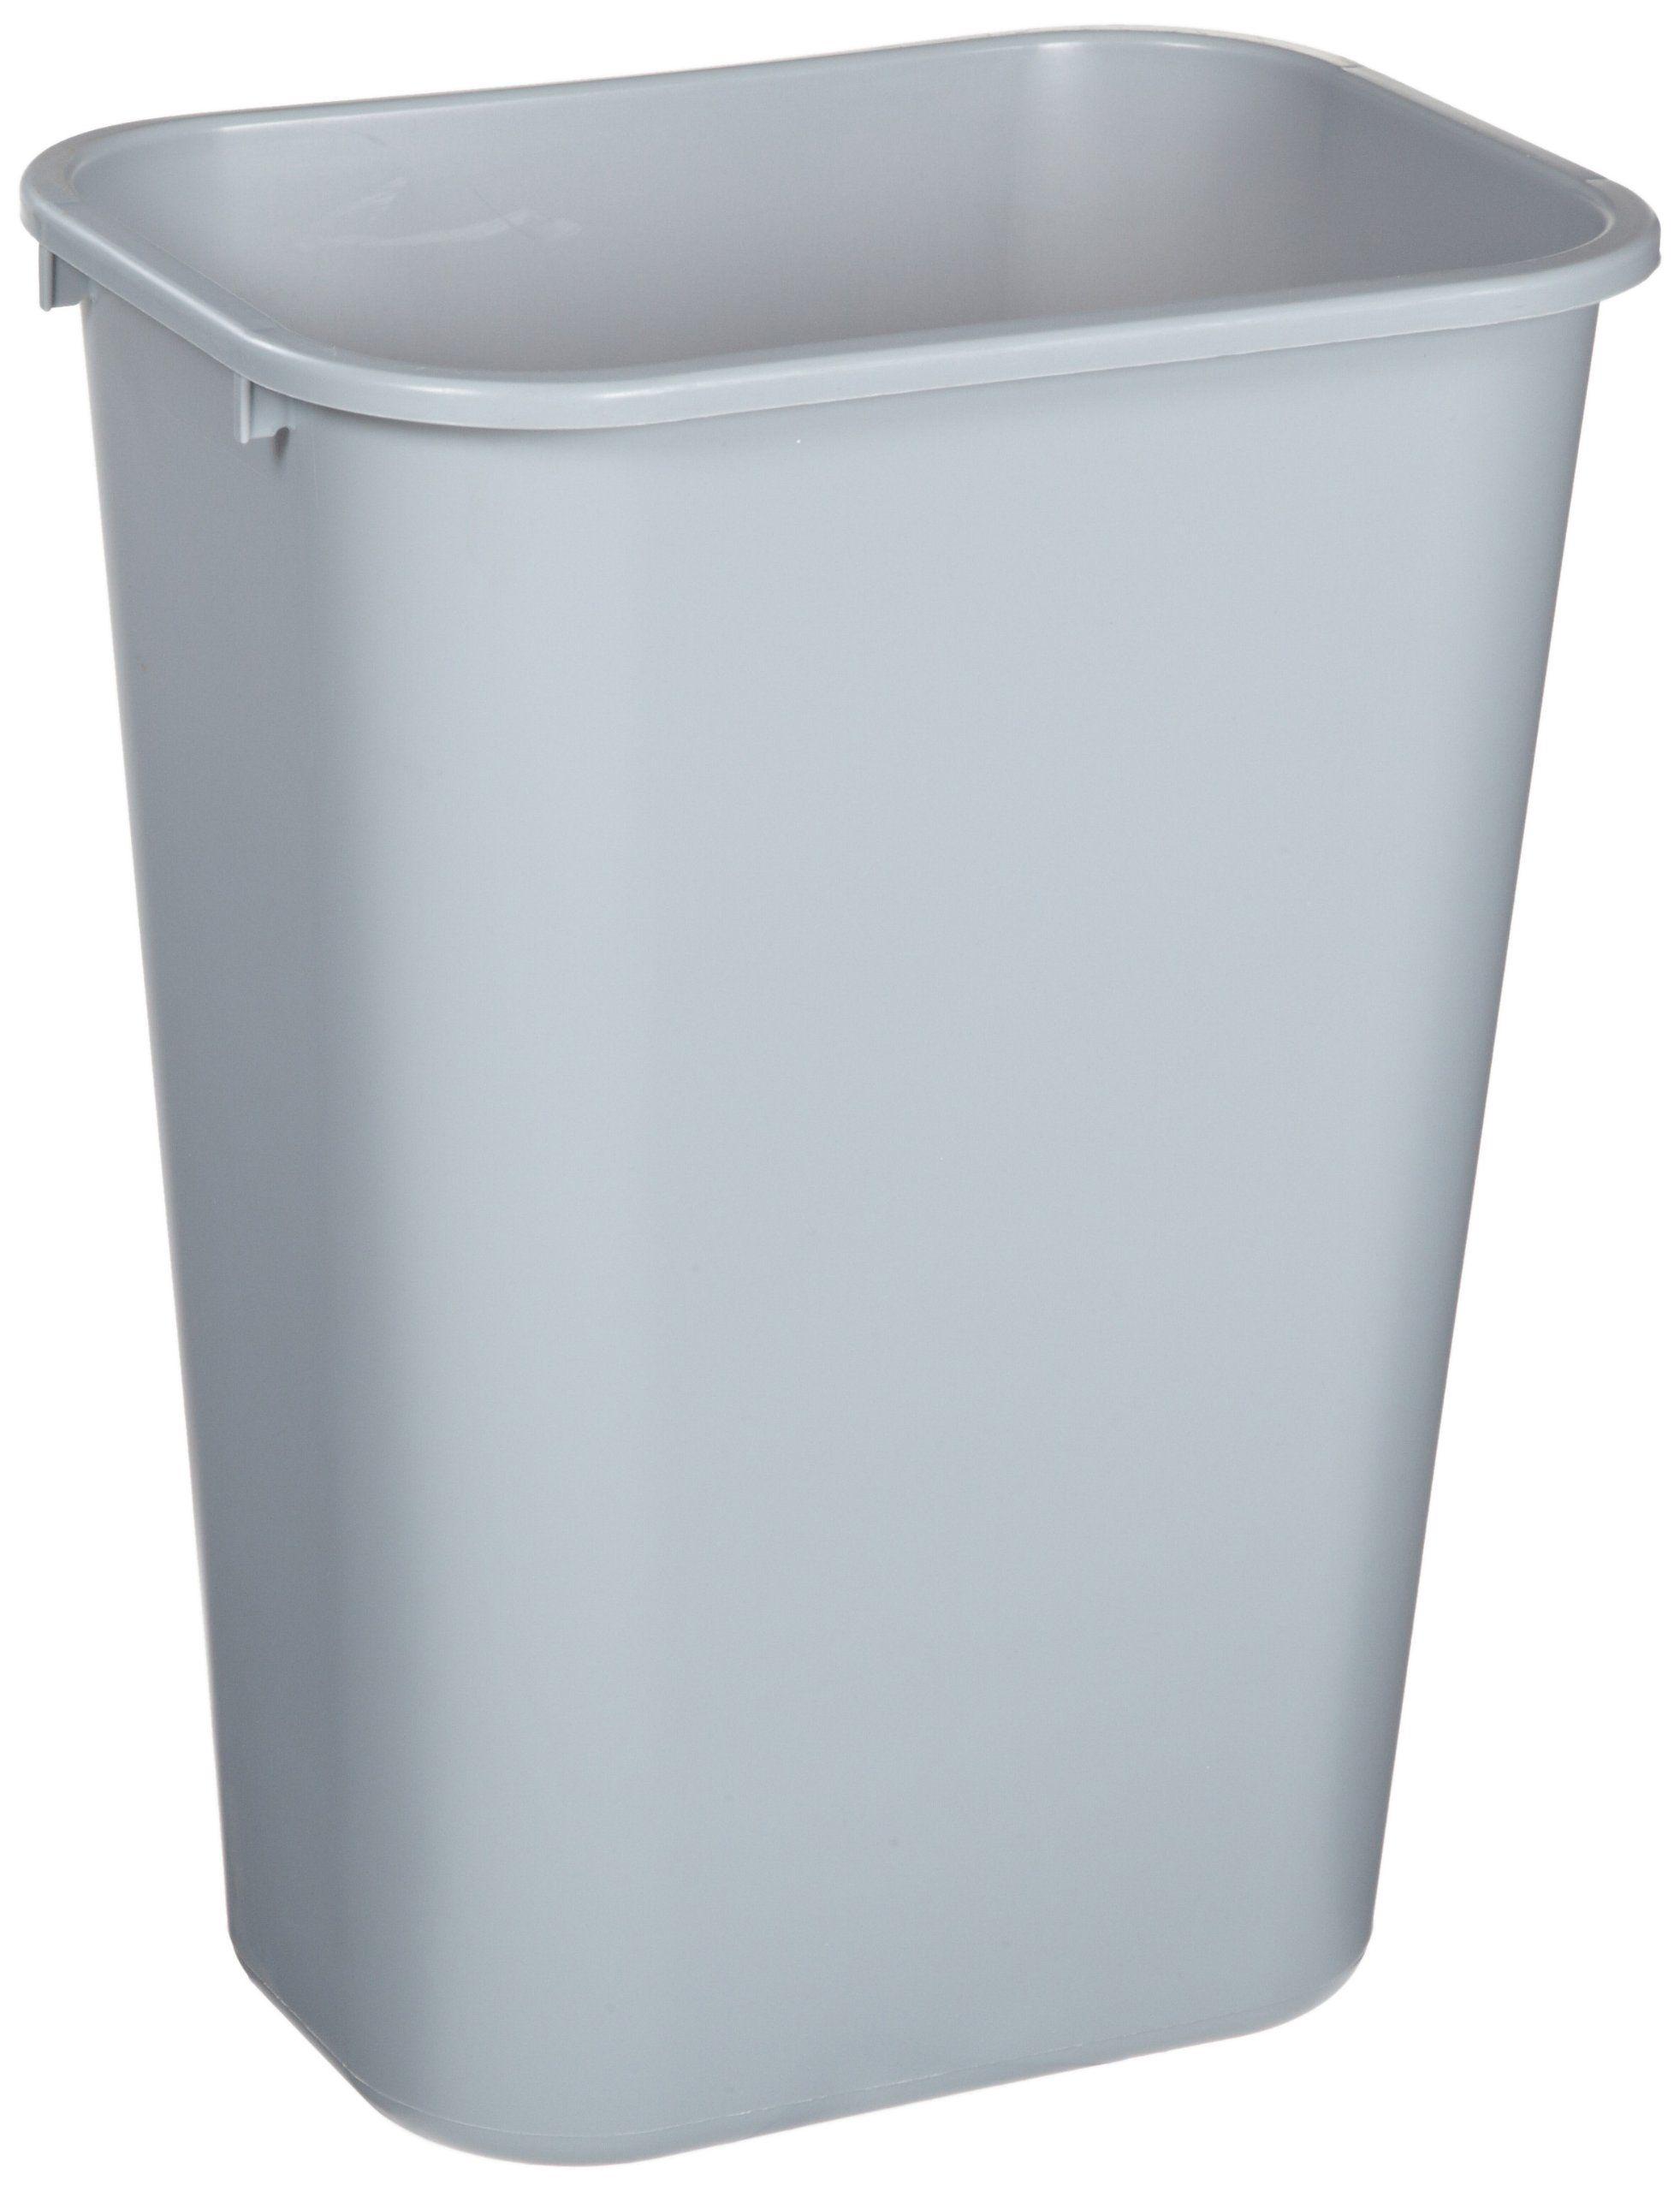 Rubbermaid Soft Molded Plastic Wastebasket Rectangular 10 25